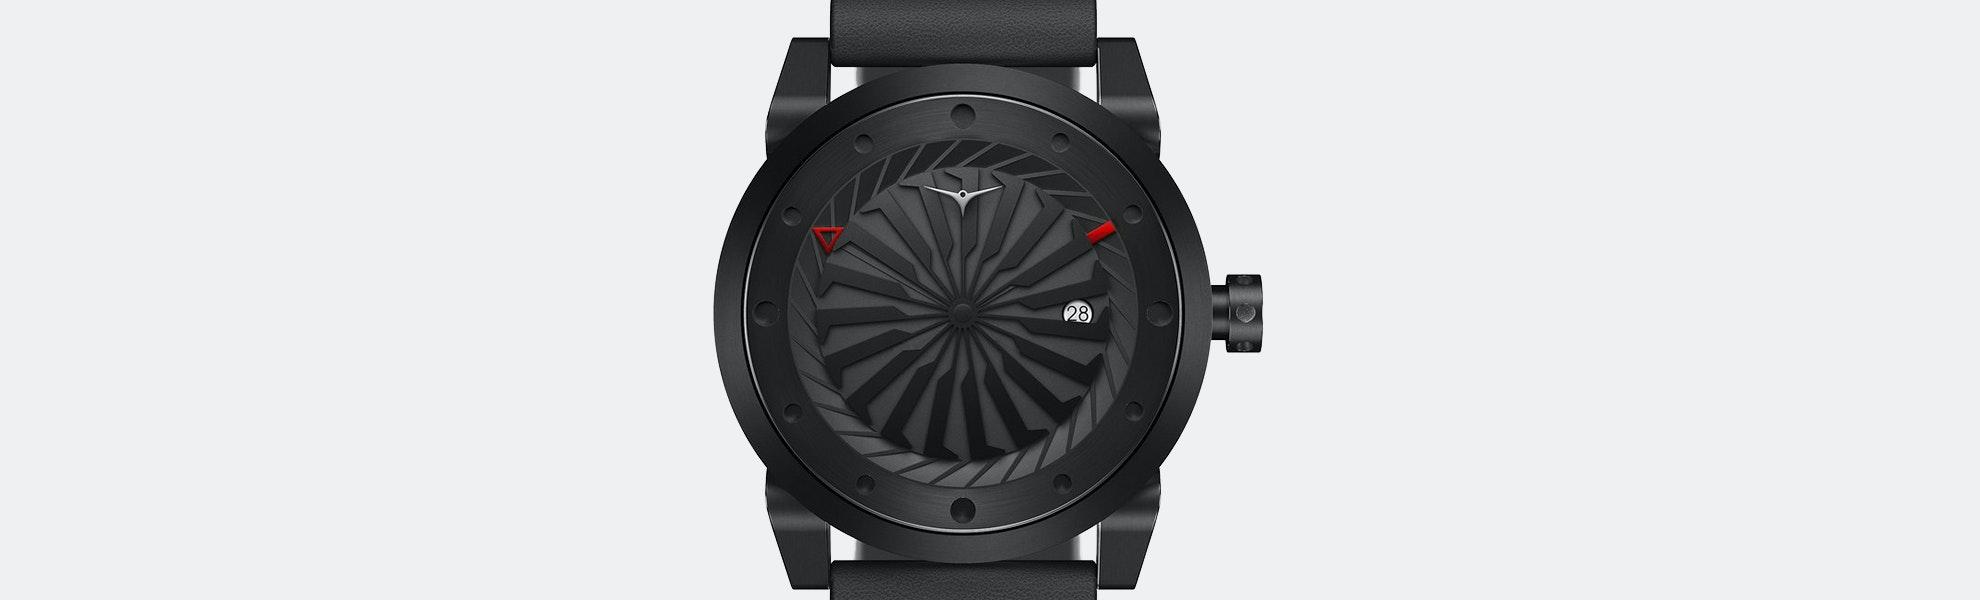 Zinvo Blade Automatic Watch